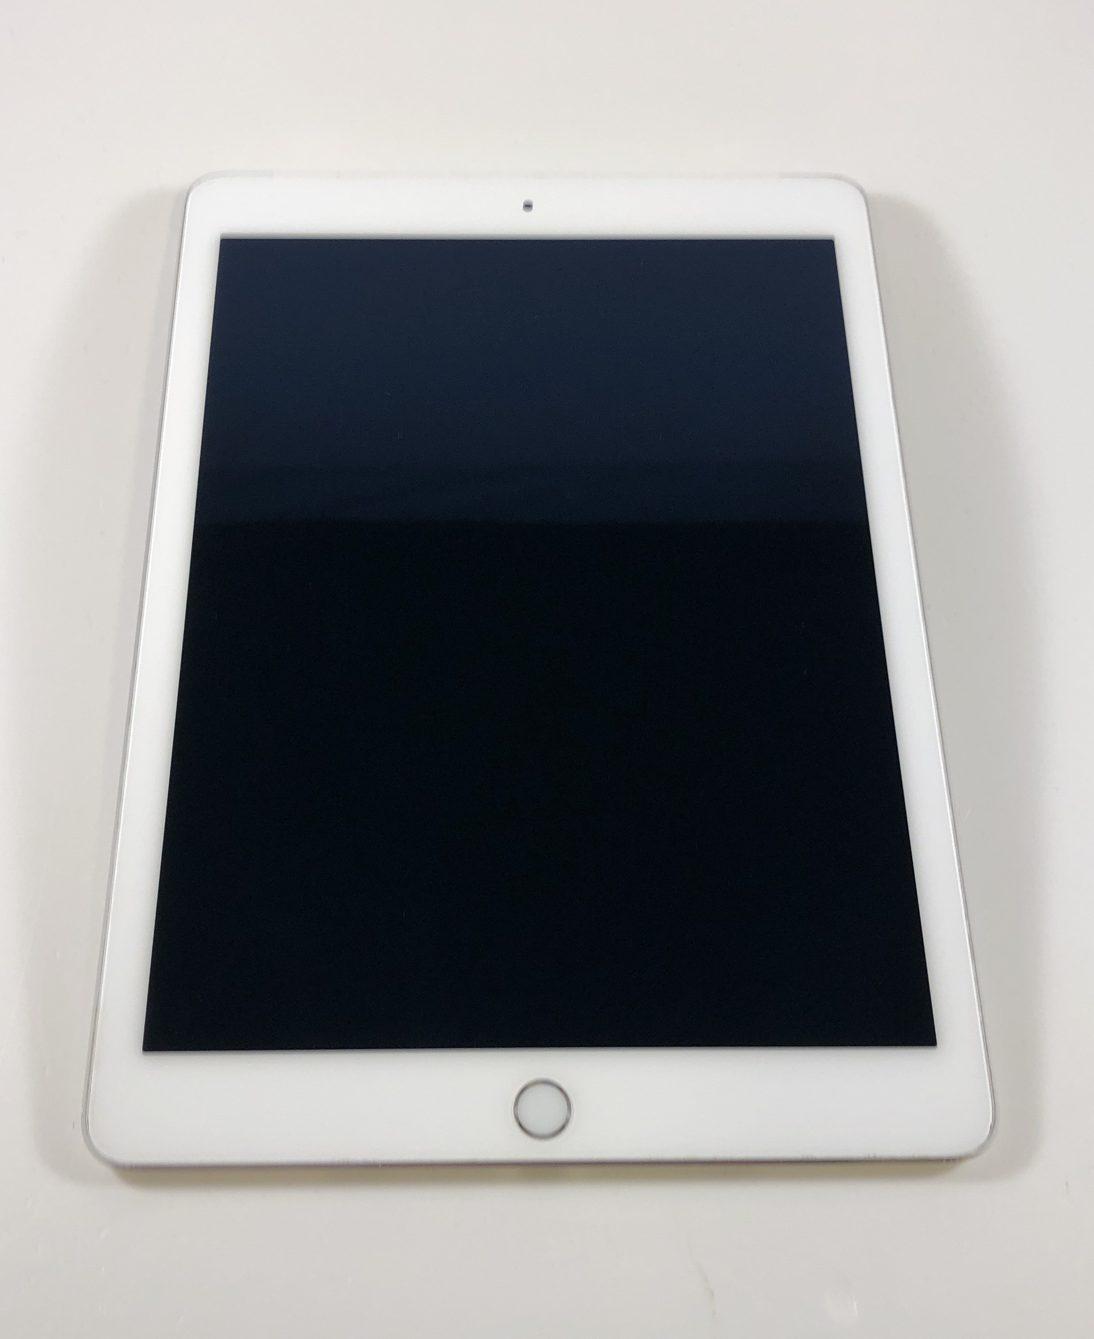 iPad Air 2 Wi-Fi + Cellular 128GB, 128GB, Silver, immagine 1